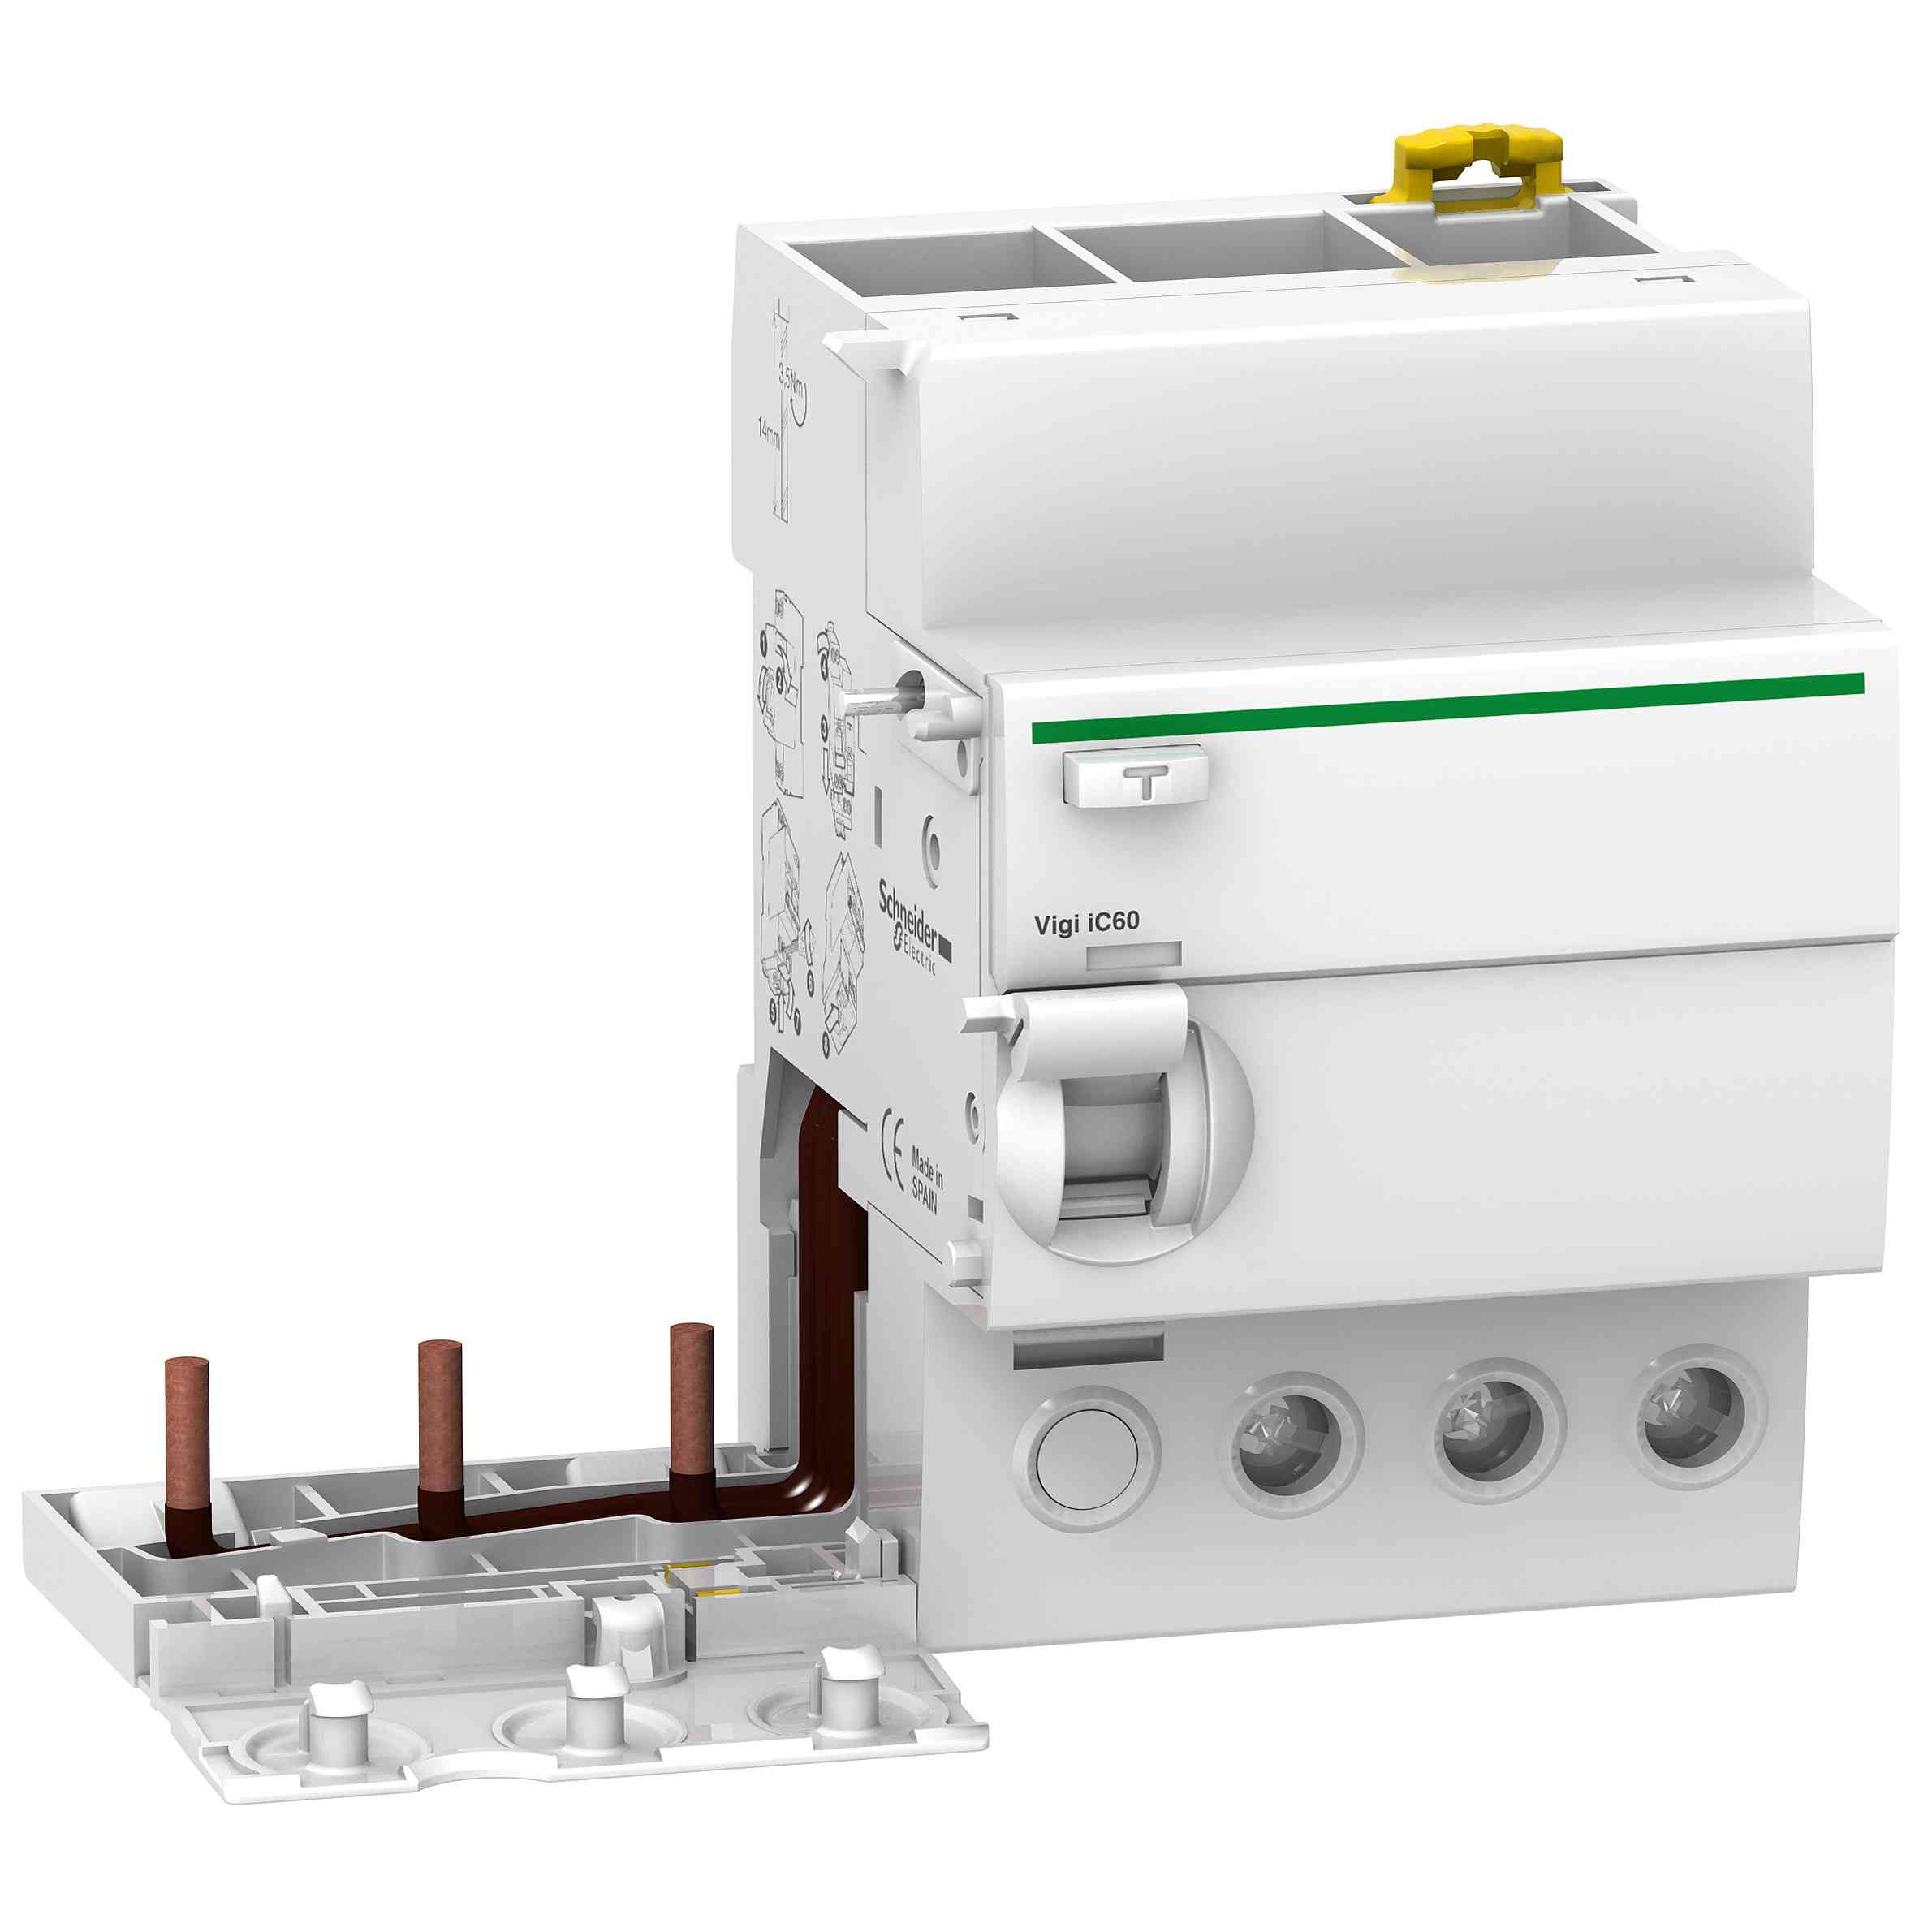 Vigi iC60 - ozemljitveni blok - 3P - 63 A - 300 mA - tip AC